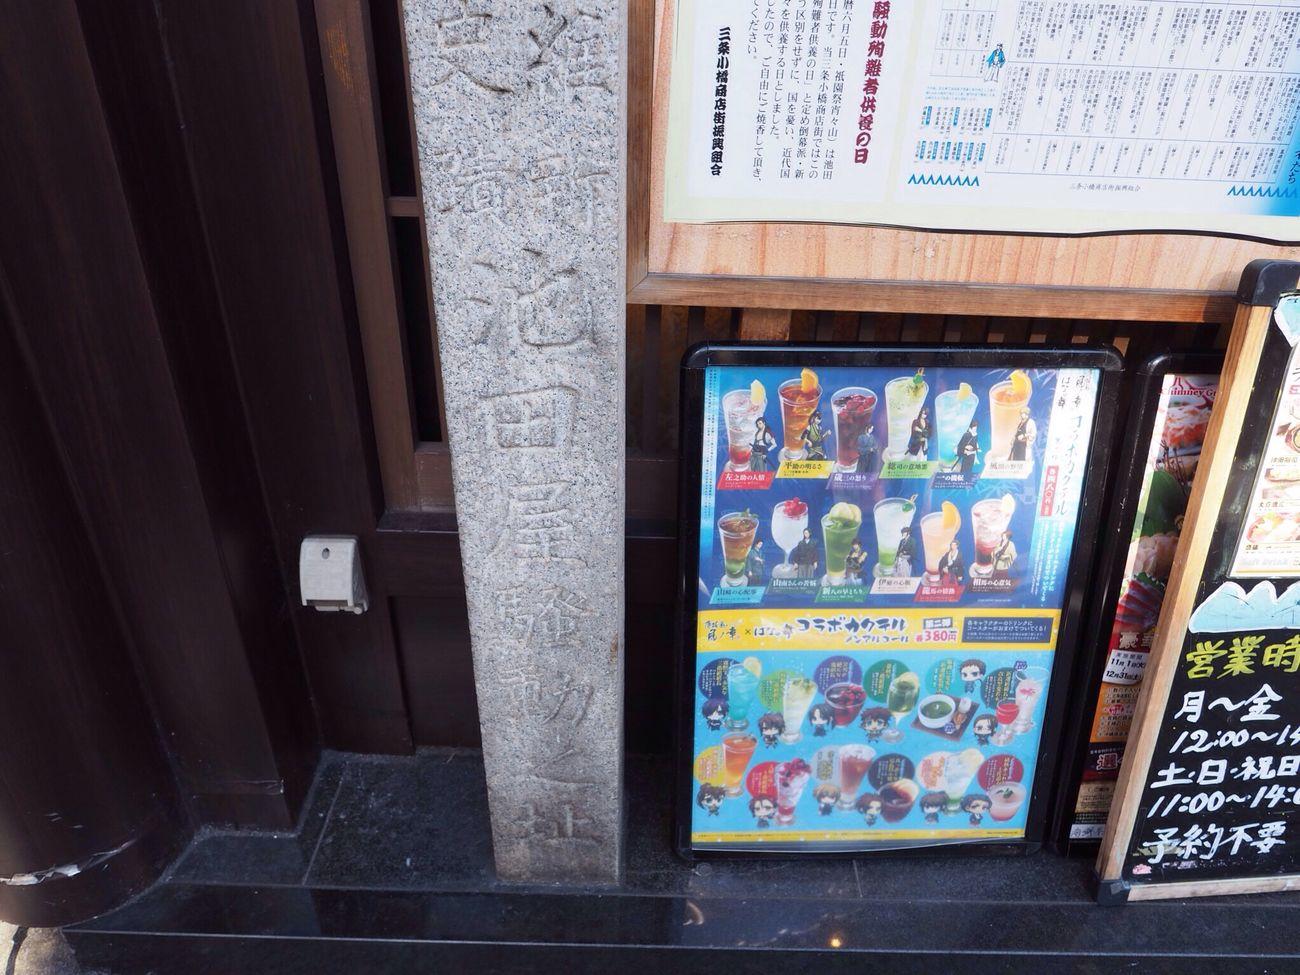 Kyoto Japan Sanjyo Ikeda-ya Shinsengumi Bakumatsu Olympus PEN-F 京都 日本 三条 池田屋 跡地 新撰組 幕末 池田屋事件 歴史